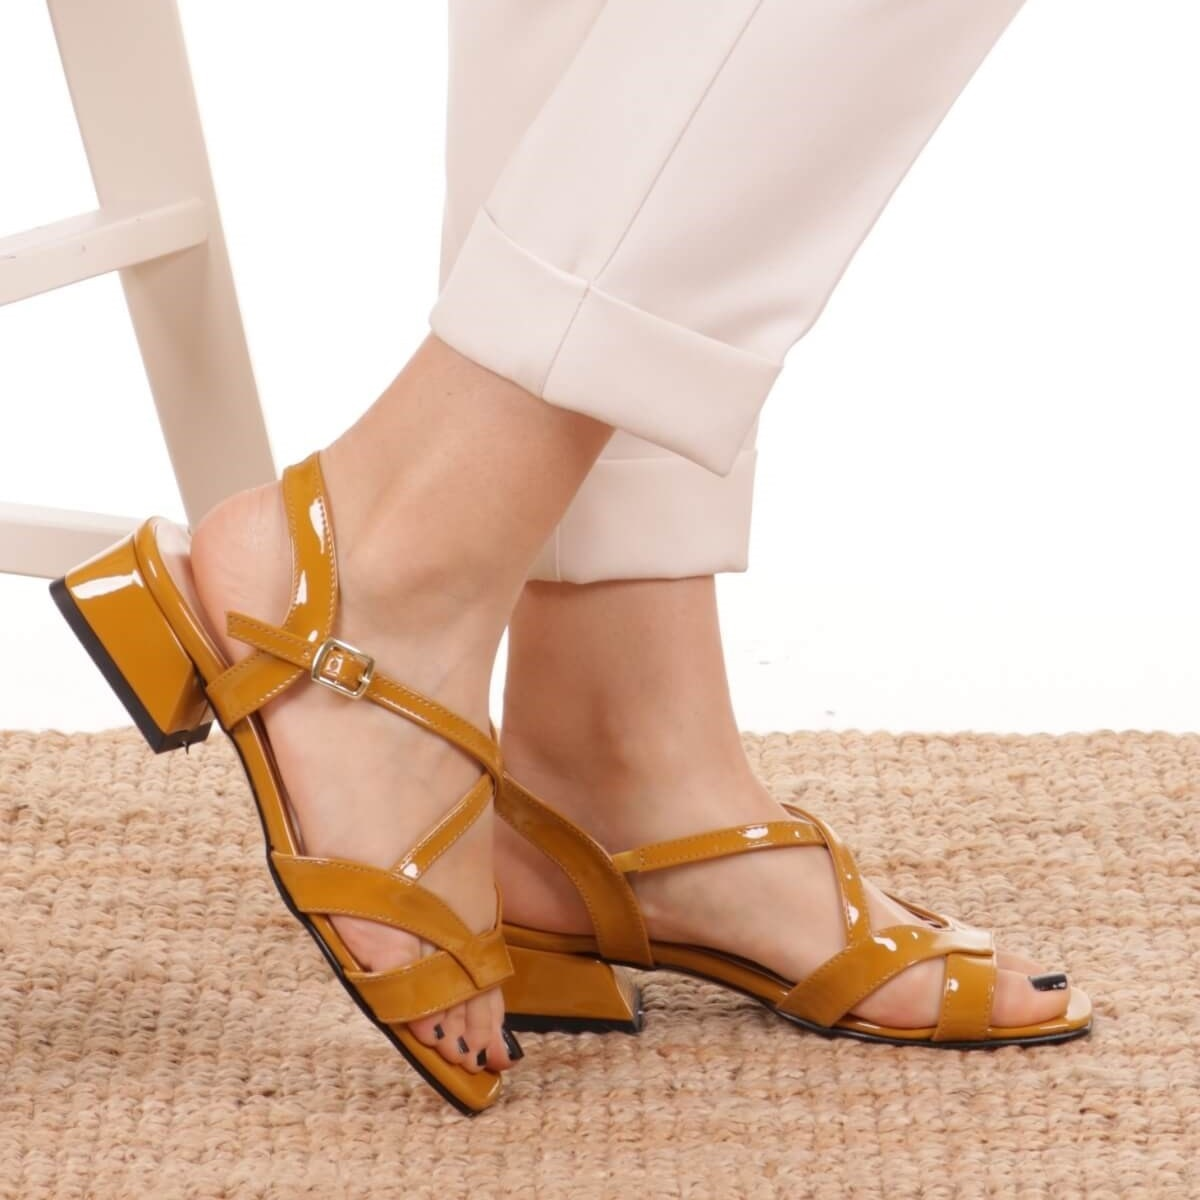 Mio Gusto Brand DORA, Black / Mustard/Powder, 3Cm Heel-height, women's Quality Sandals Shoes